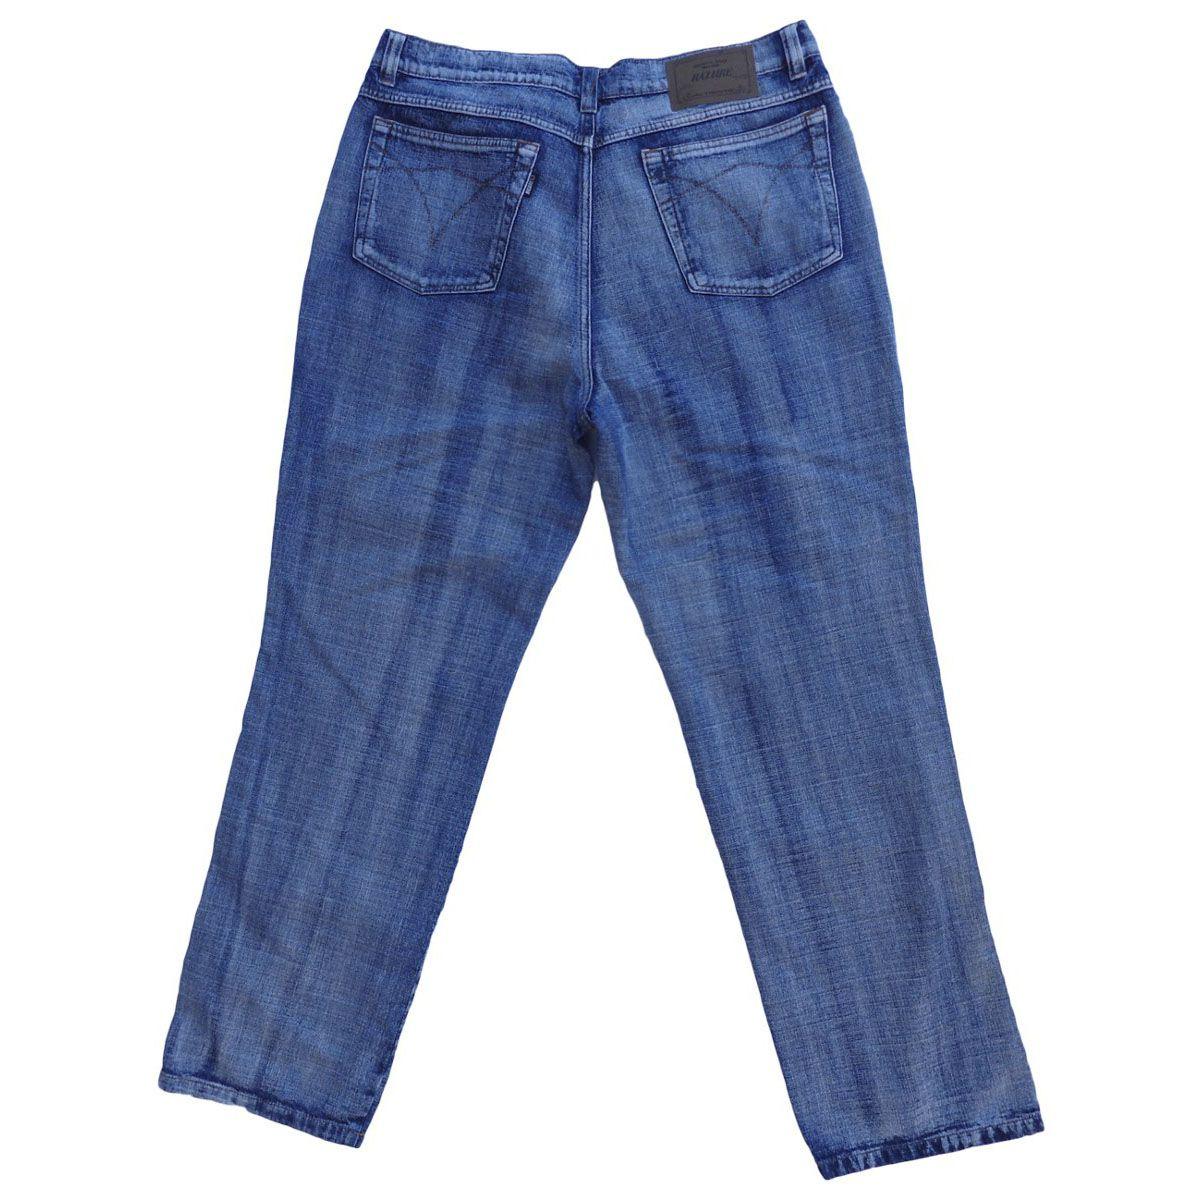 Calça Jeans Masculina Tradicional Plus Size